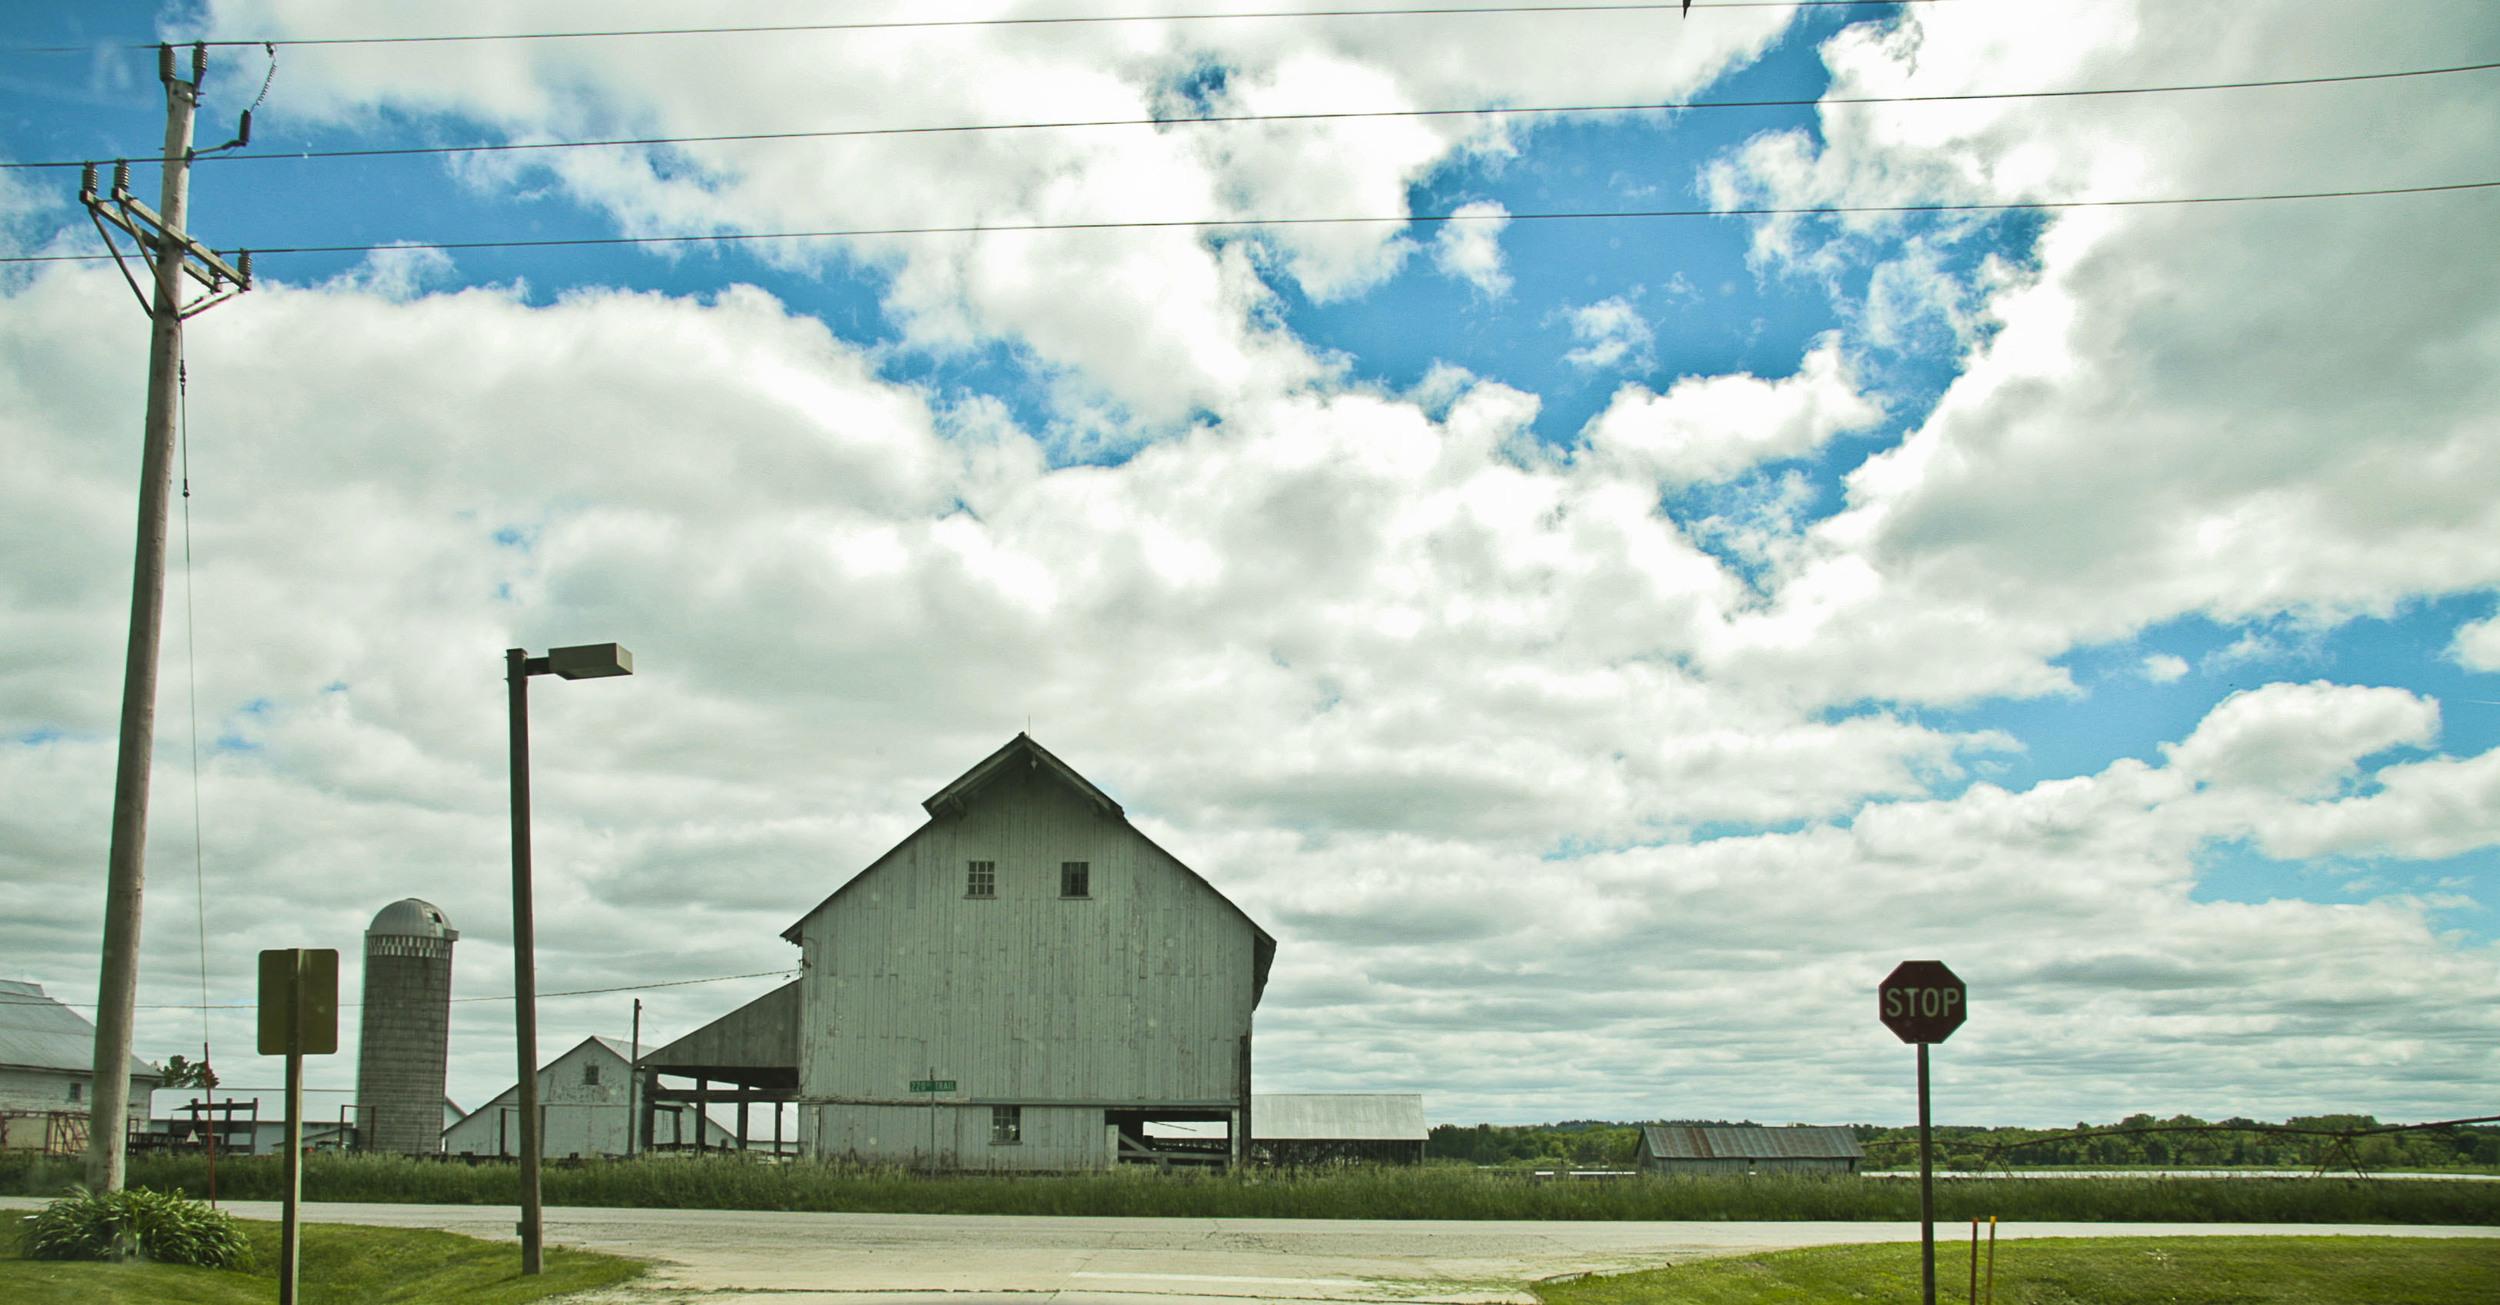 Intersection, Kalona Iowa